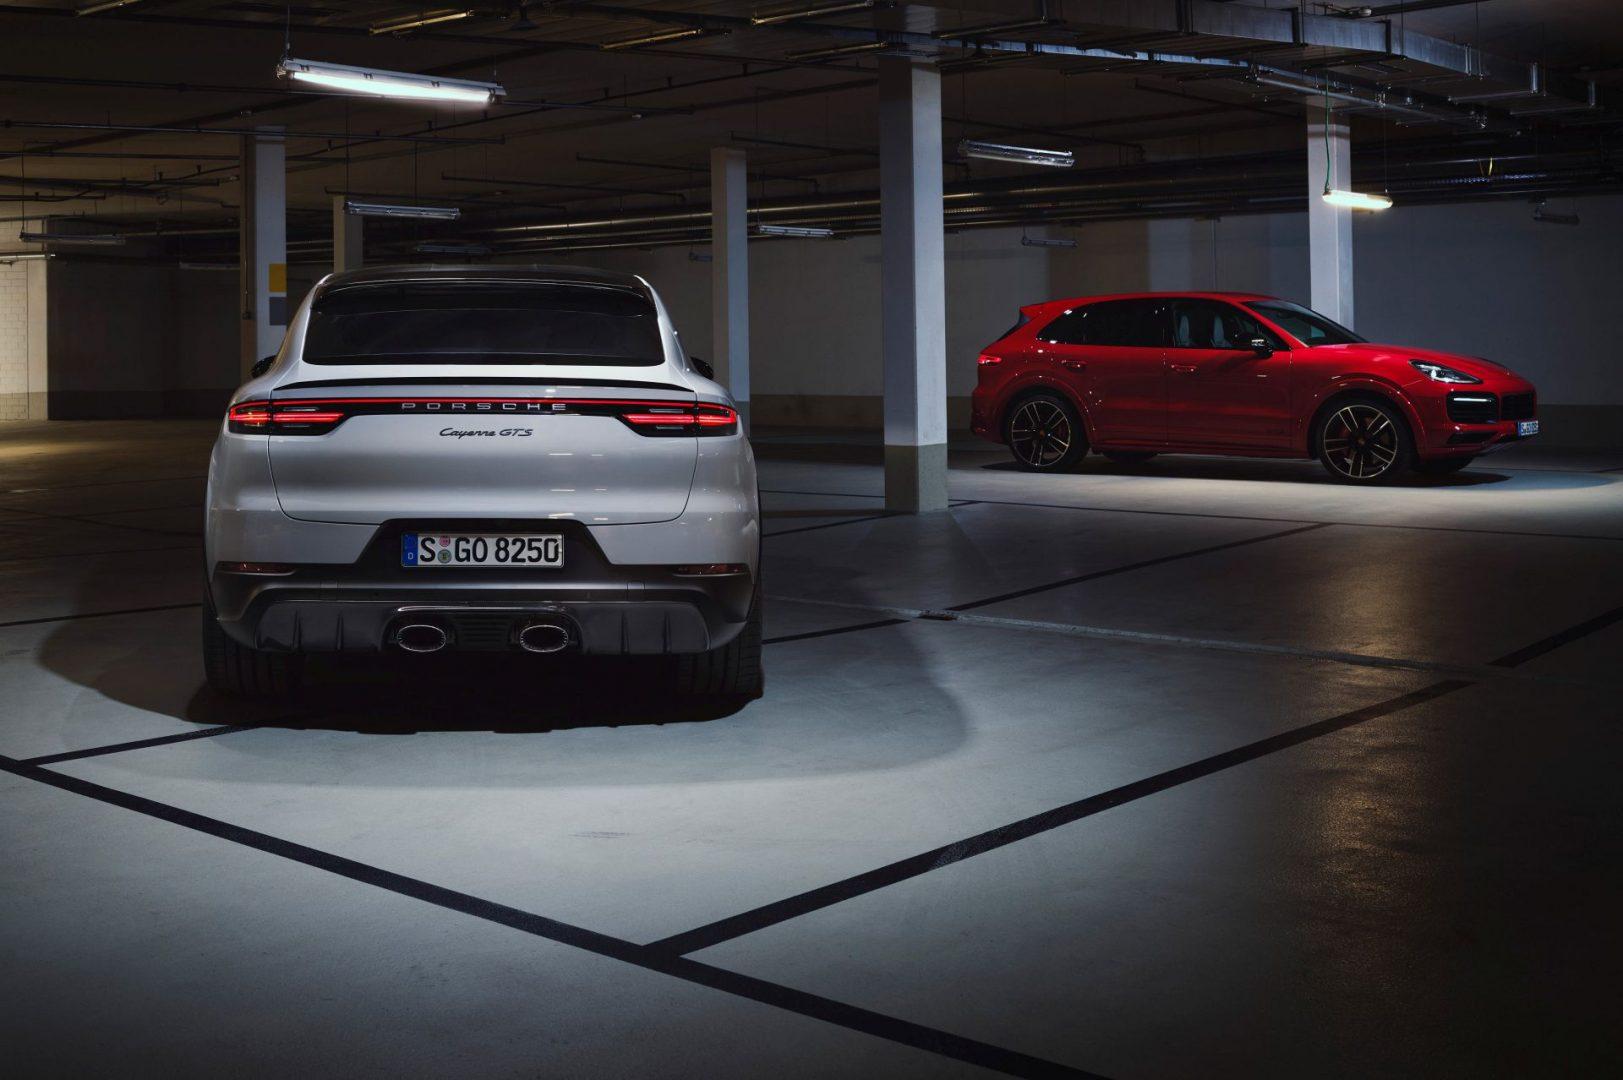 Predstavljeni su 460 KS snažni Porsche Cayenne GTS i Cayenne GTS Coupe